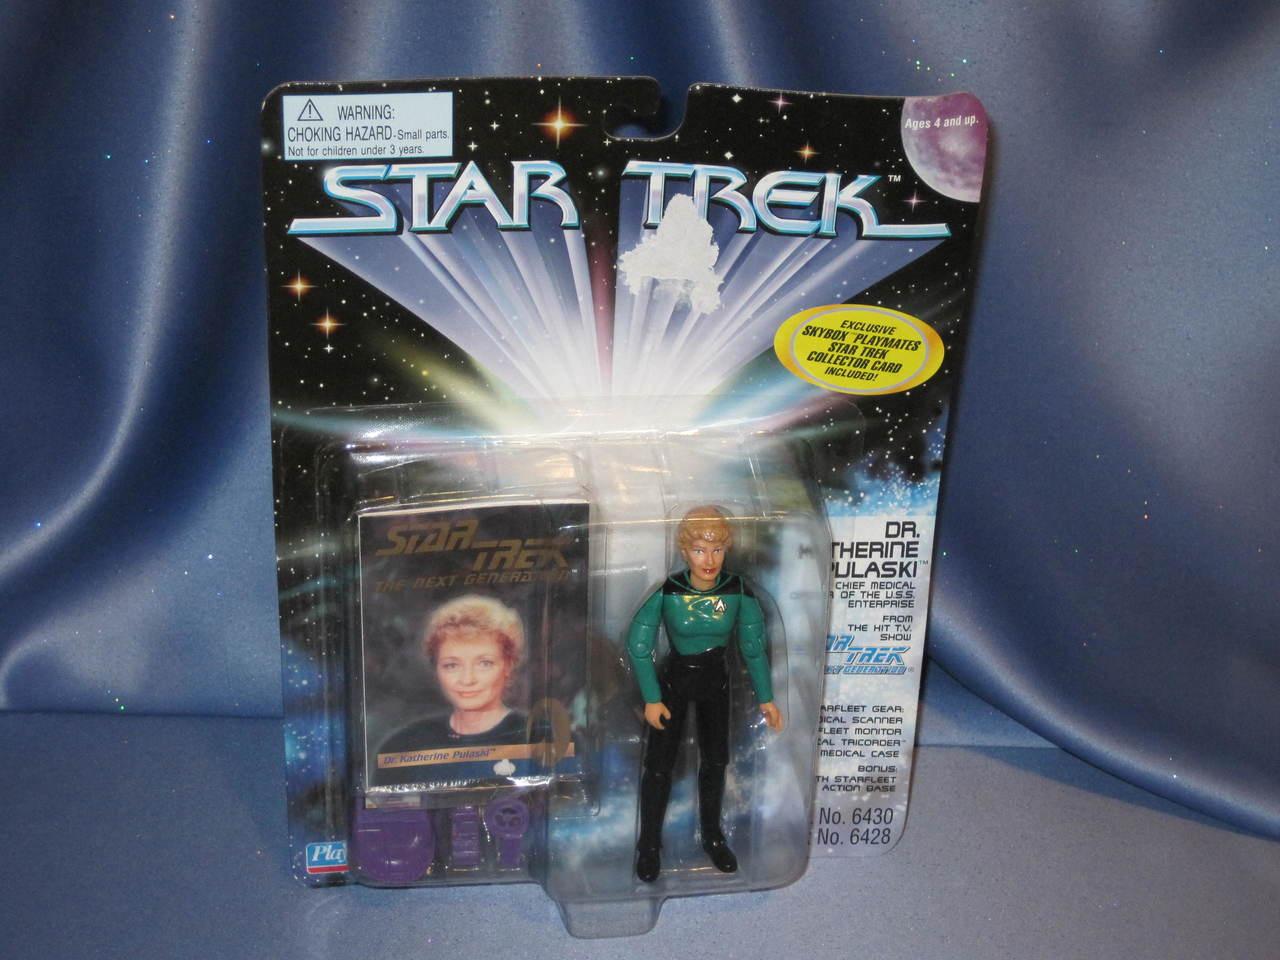 Star Trek - Dr. Katherine Pulaski - Action Figure.